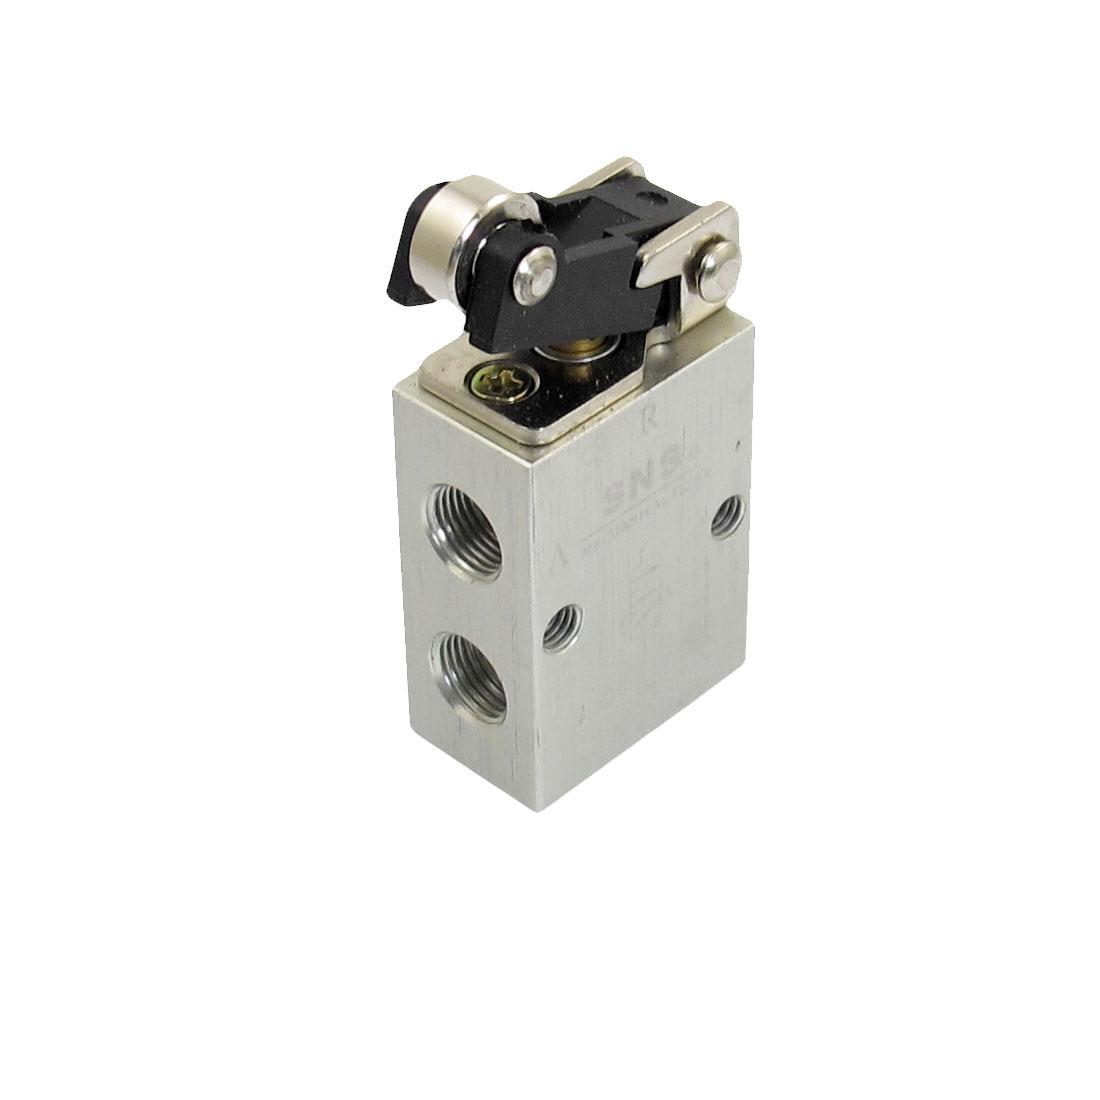 "S3R-06 2 Position 3 Way Mechanical Roller Pneumatic Valve 1/8"" PT"